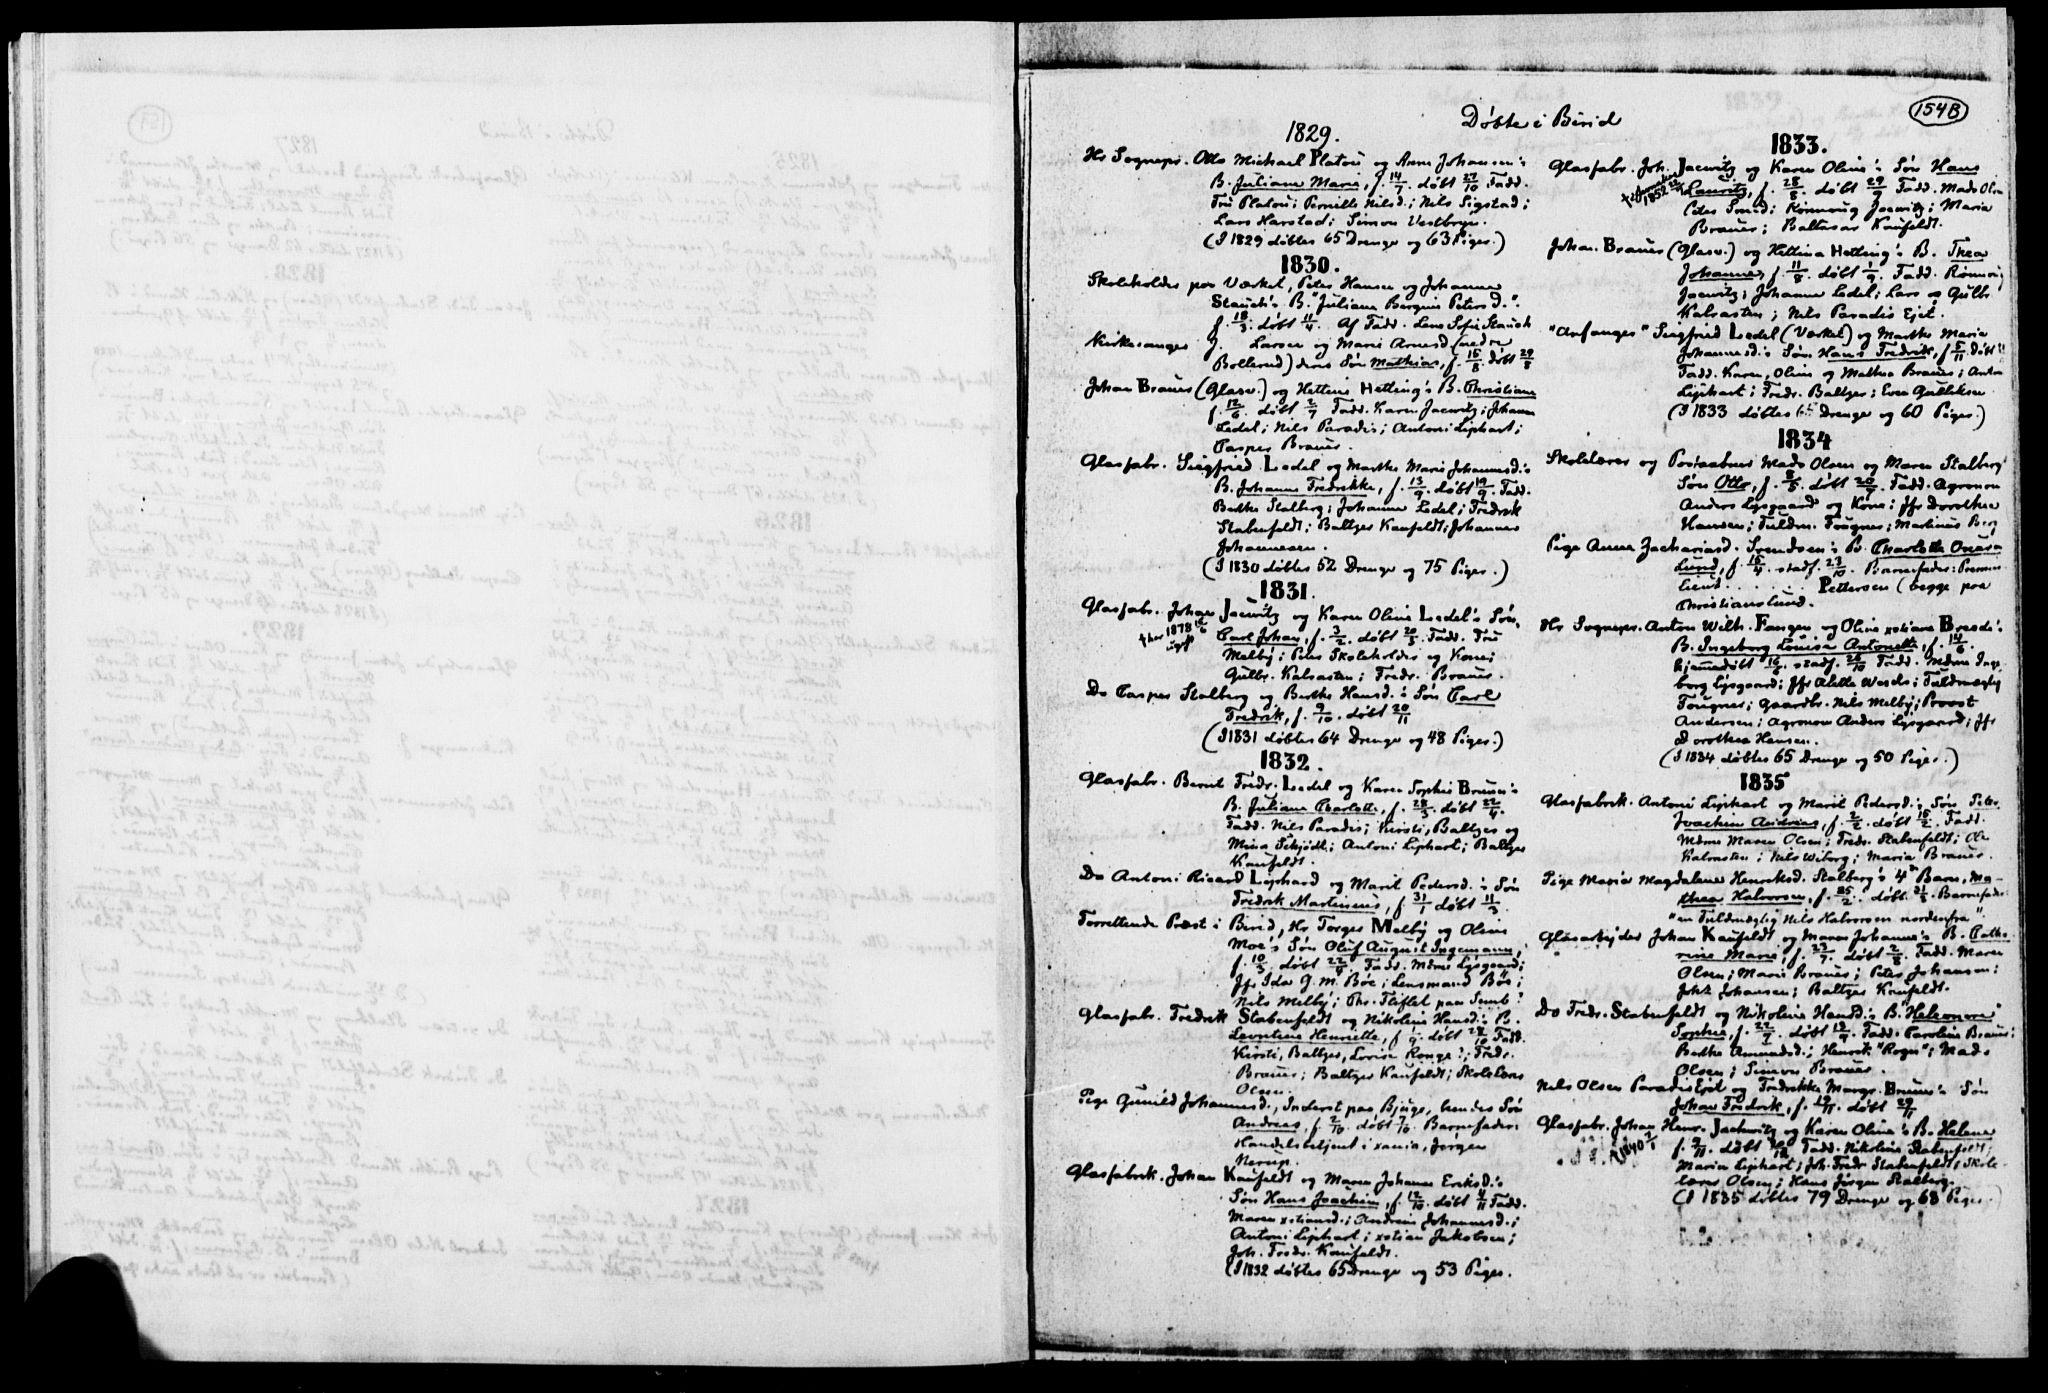 SAH, Biri prestekontor, Ministerialbok, 1730-1879, s. 154b